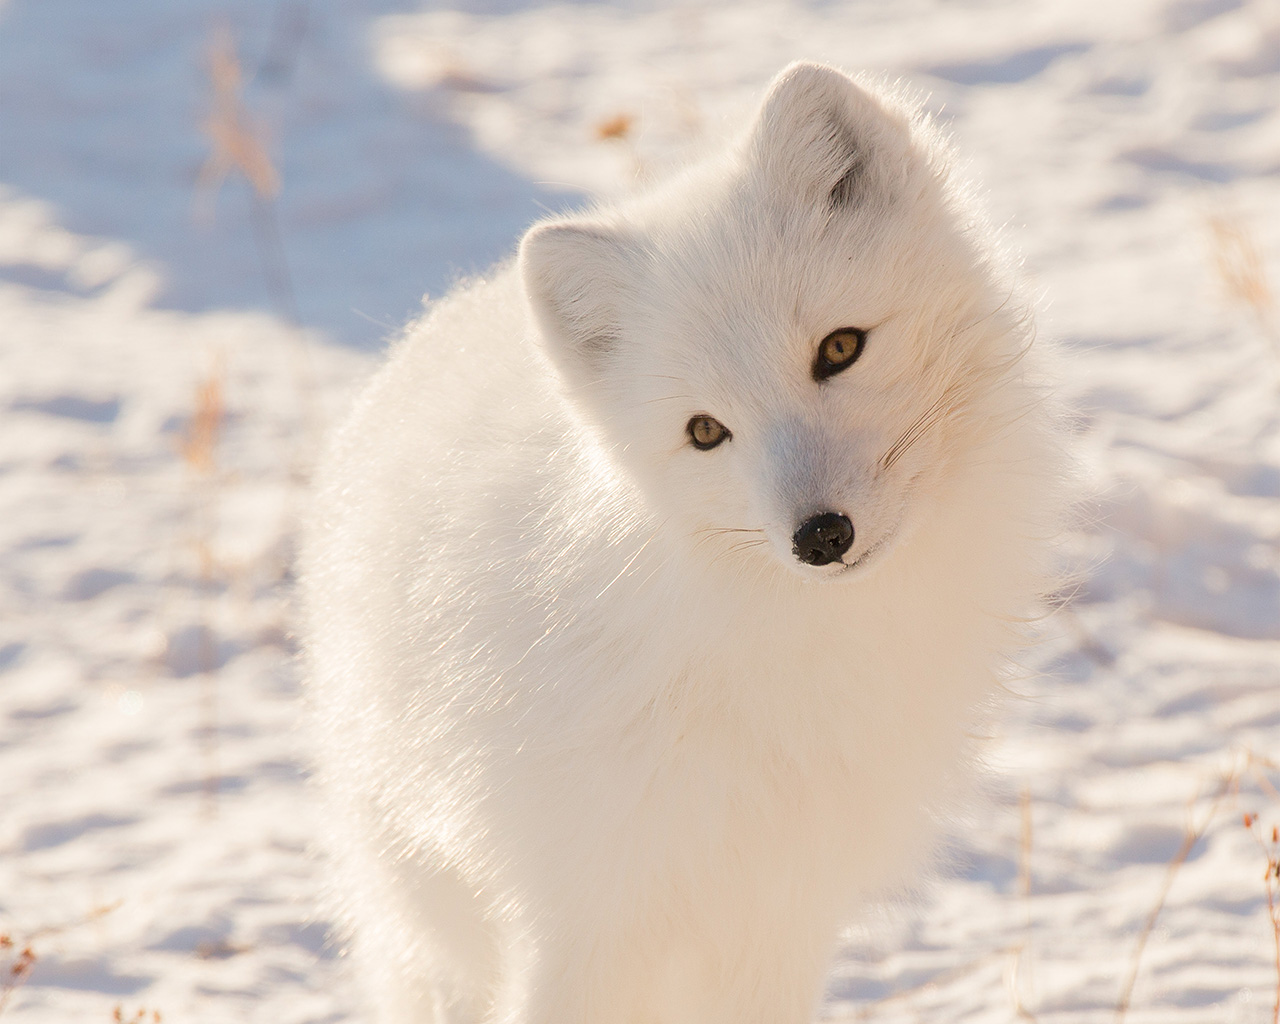 Cute Fall Background Wallpaper Mz77 Winter Animal Fox White Wallpaper